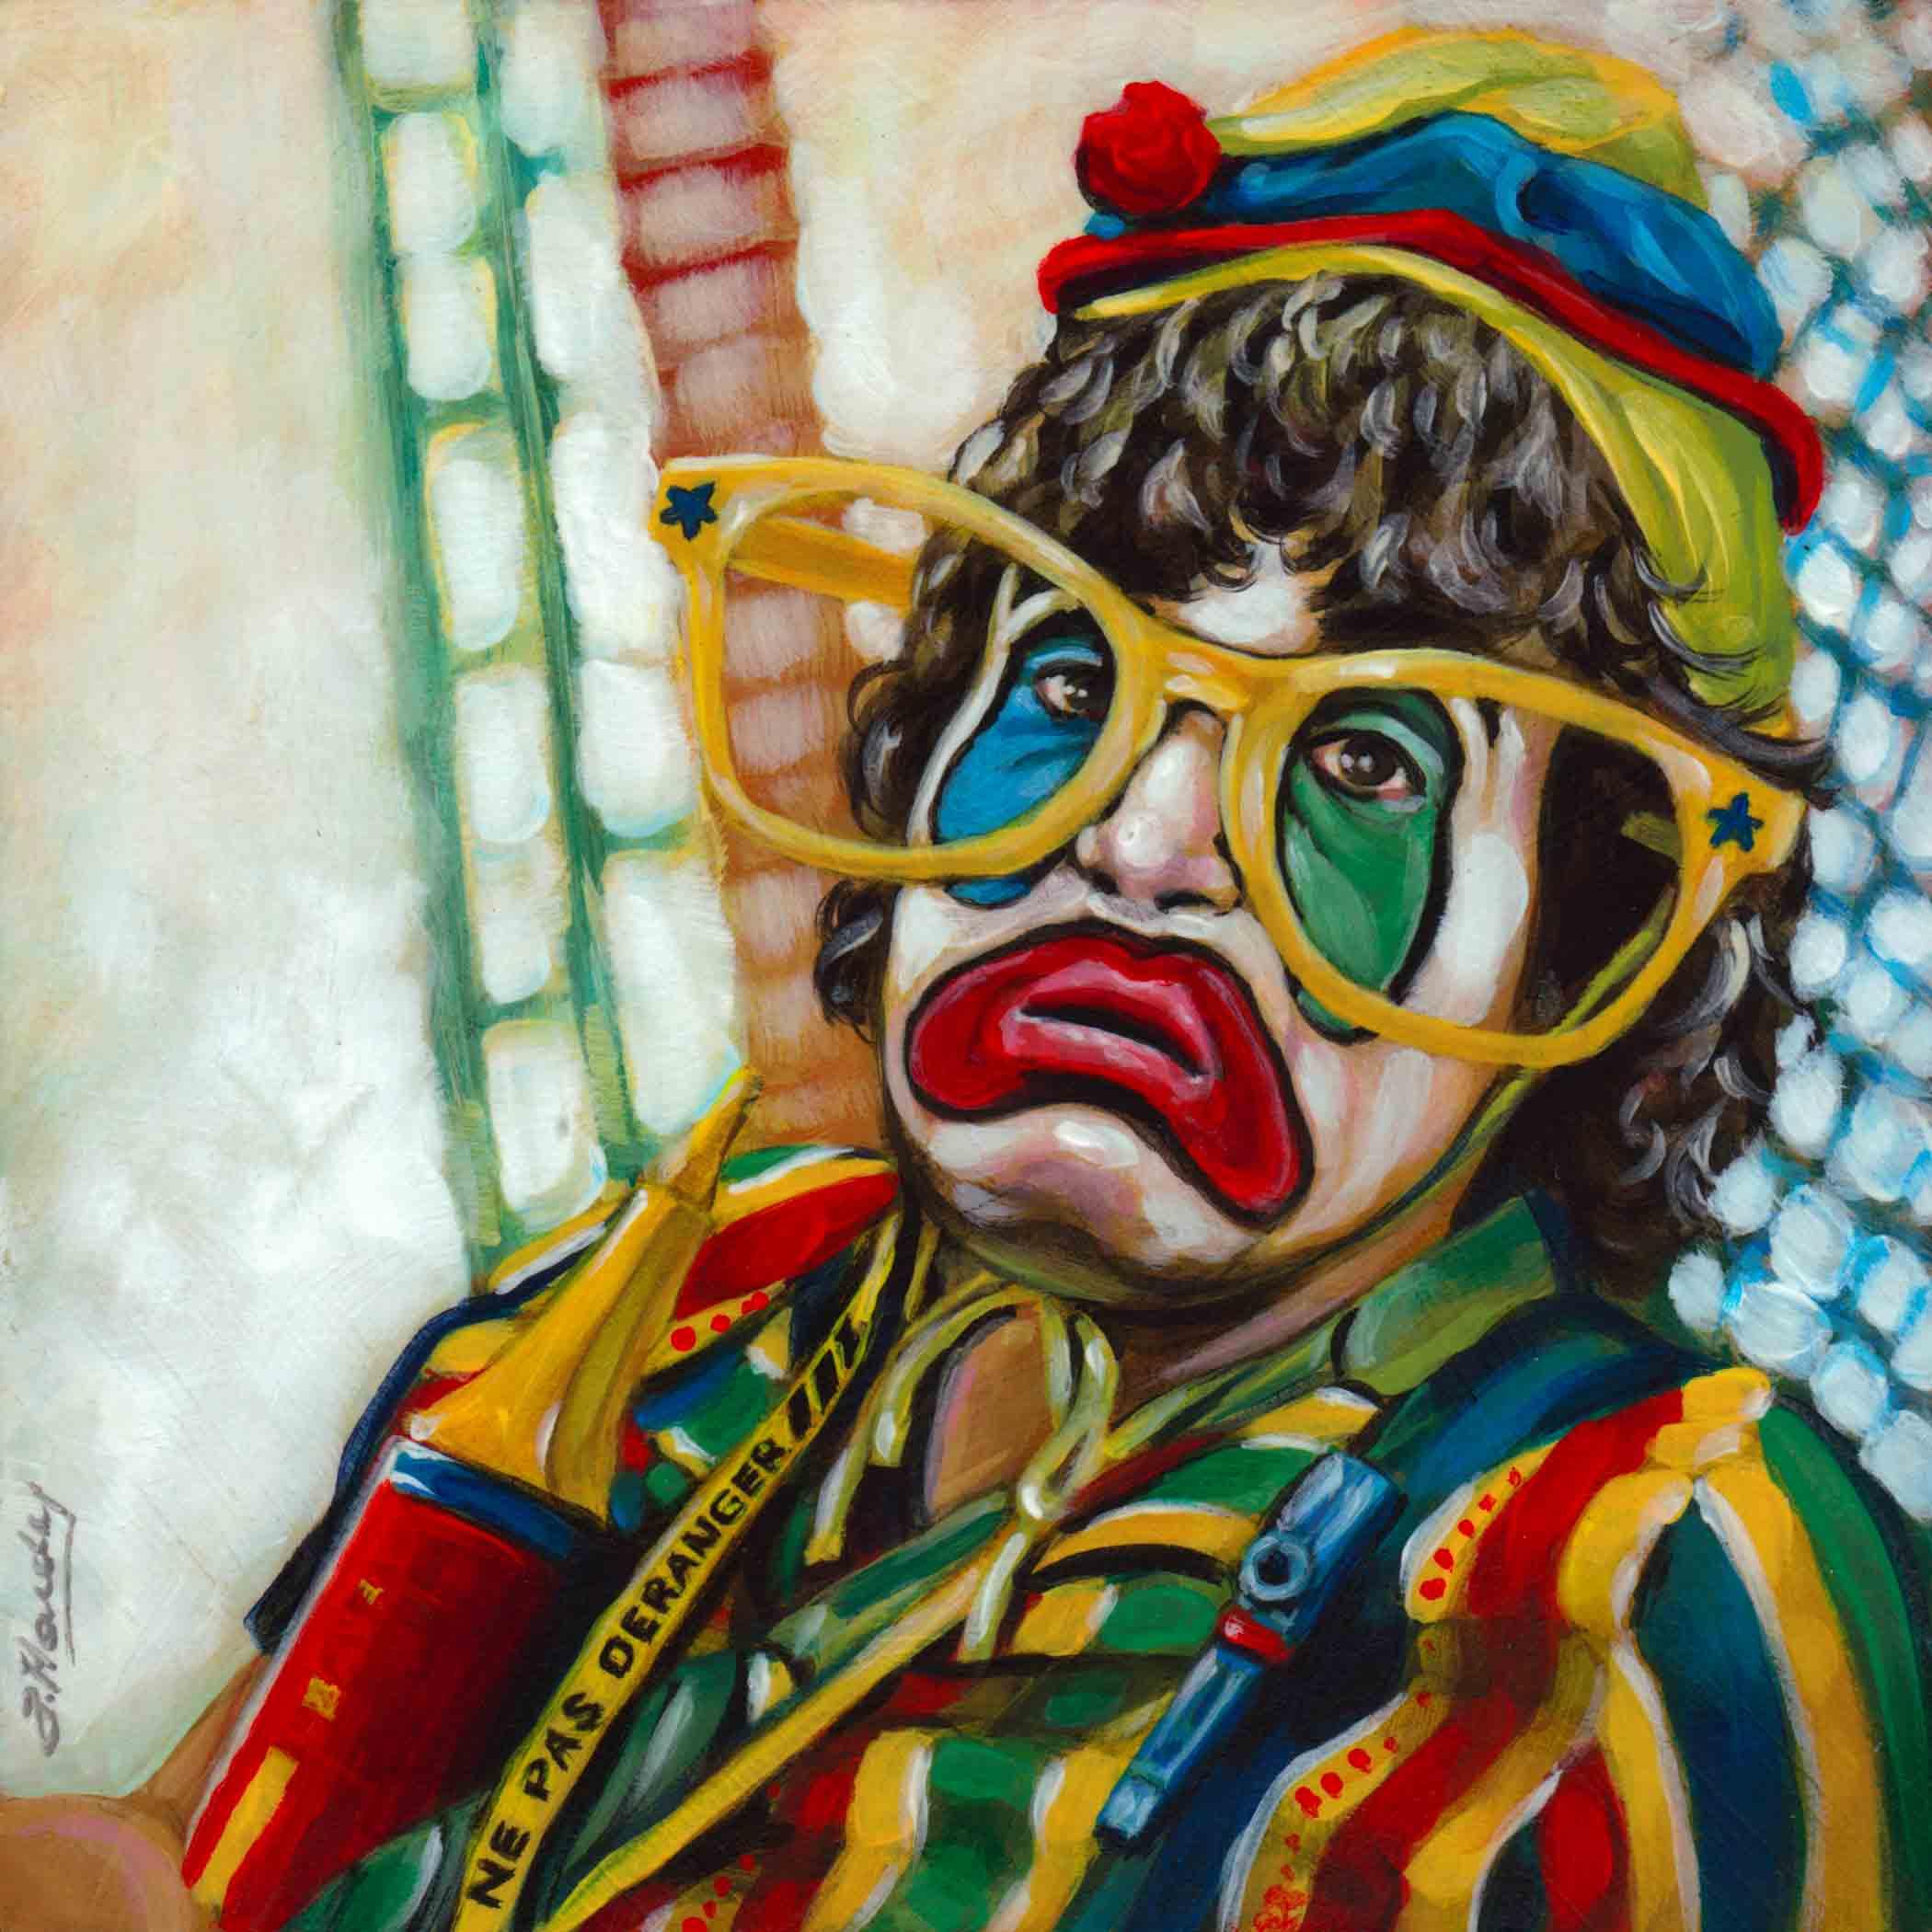 """At Arms Length#34, Patmoll the Clown"" original fine art by Angela Hardy"